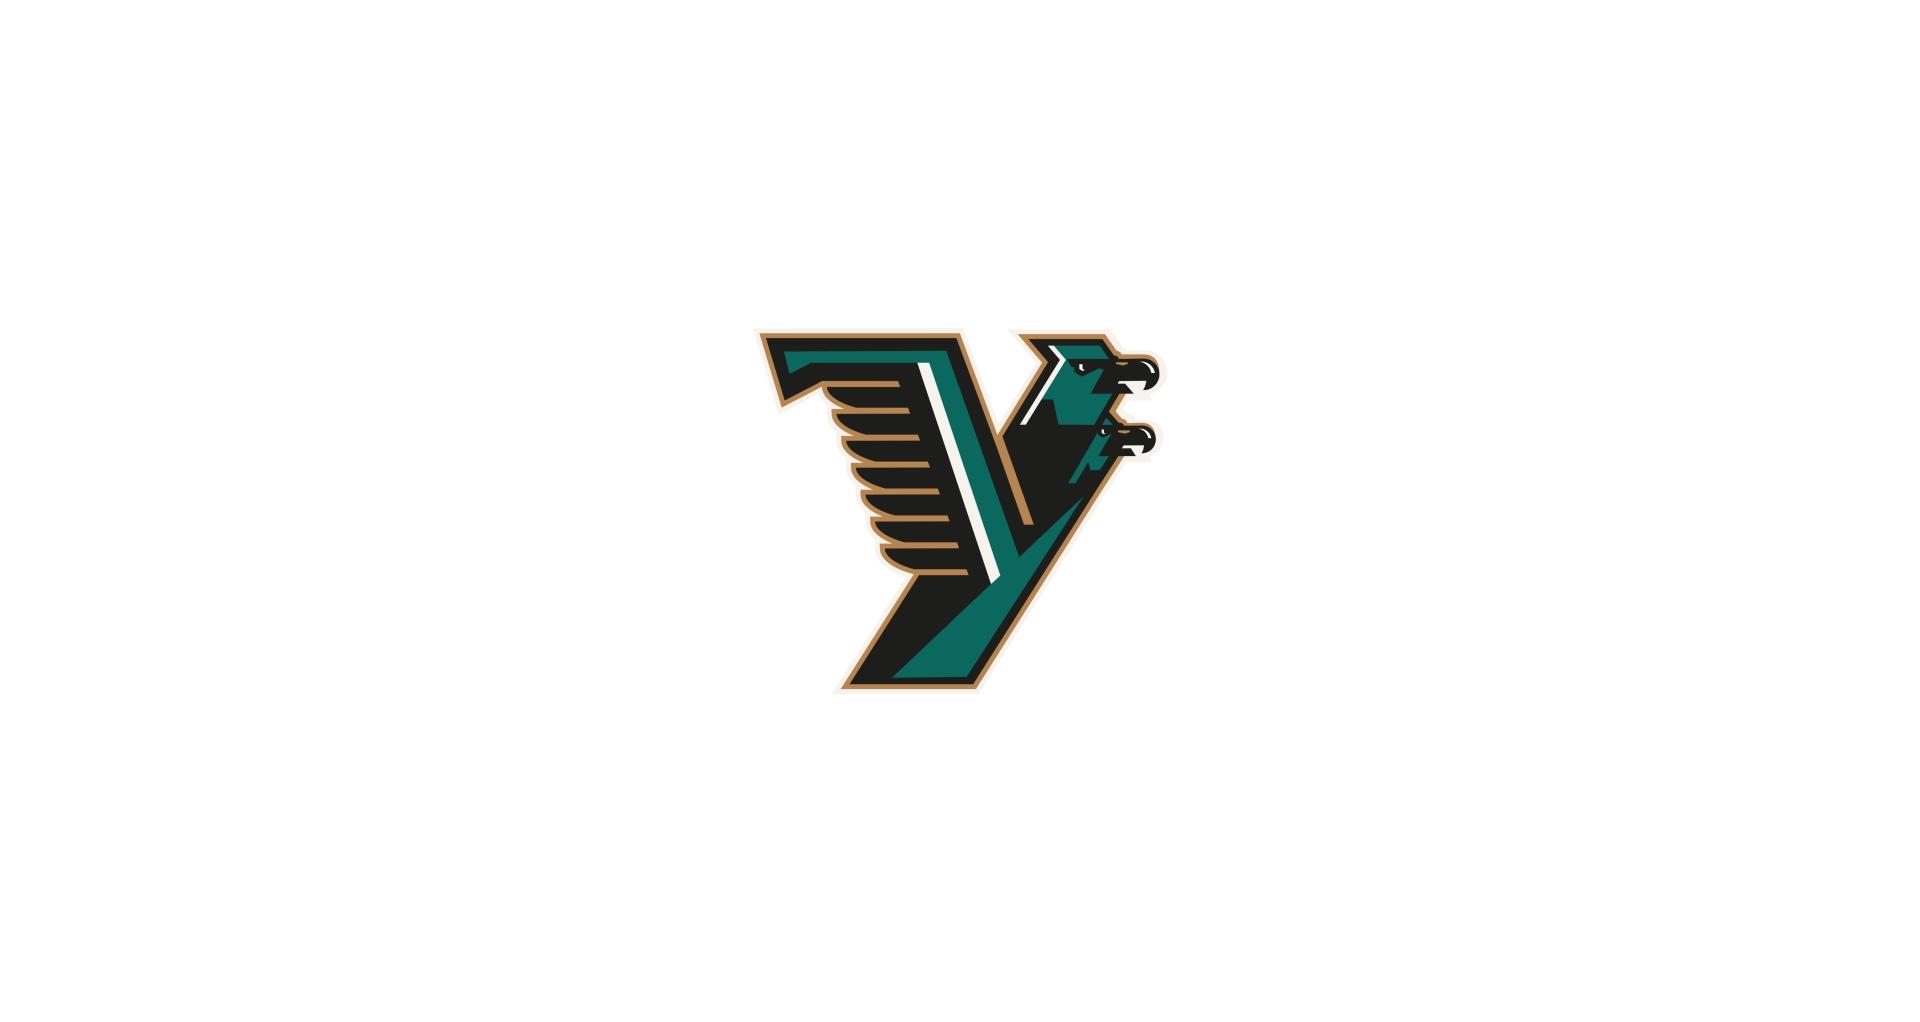 zeki-michael-logo-design-graphic-branding-identity-freelance-studio-design-yefi